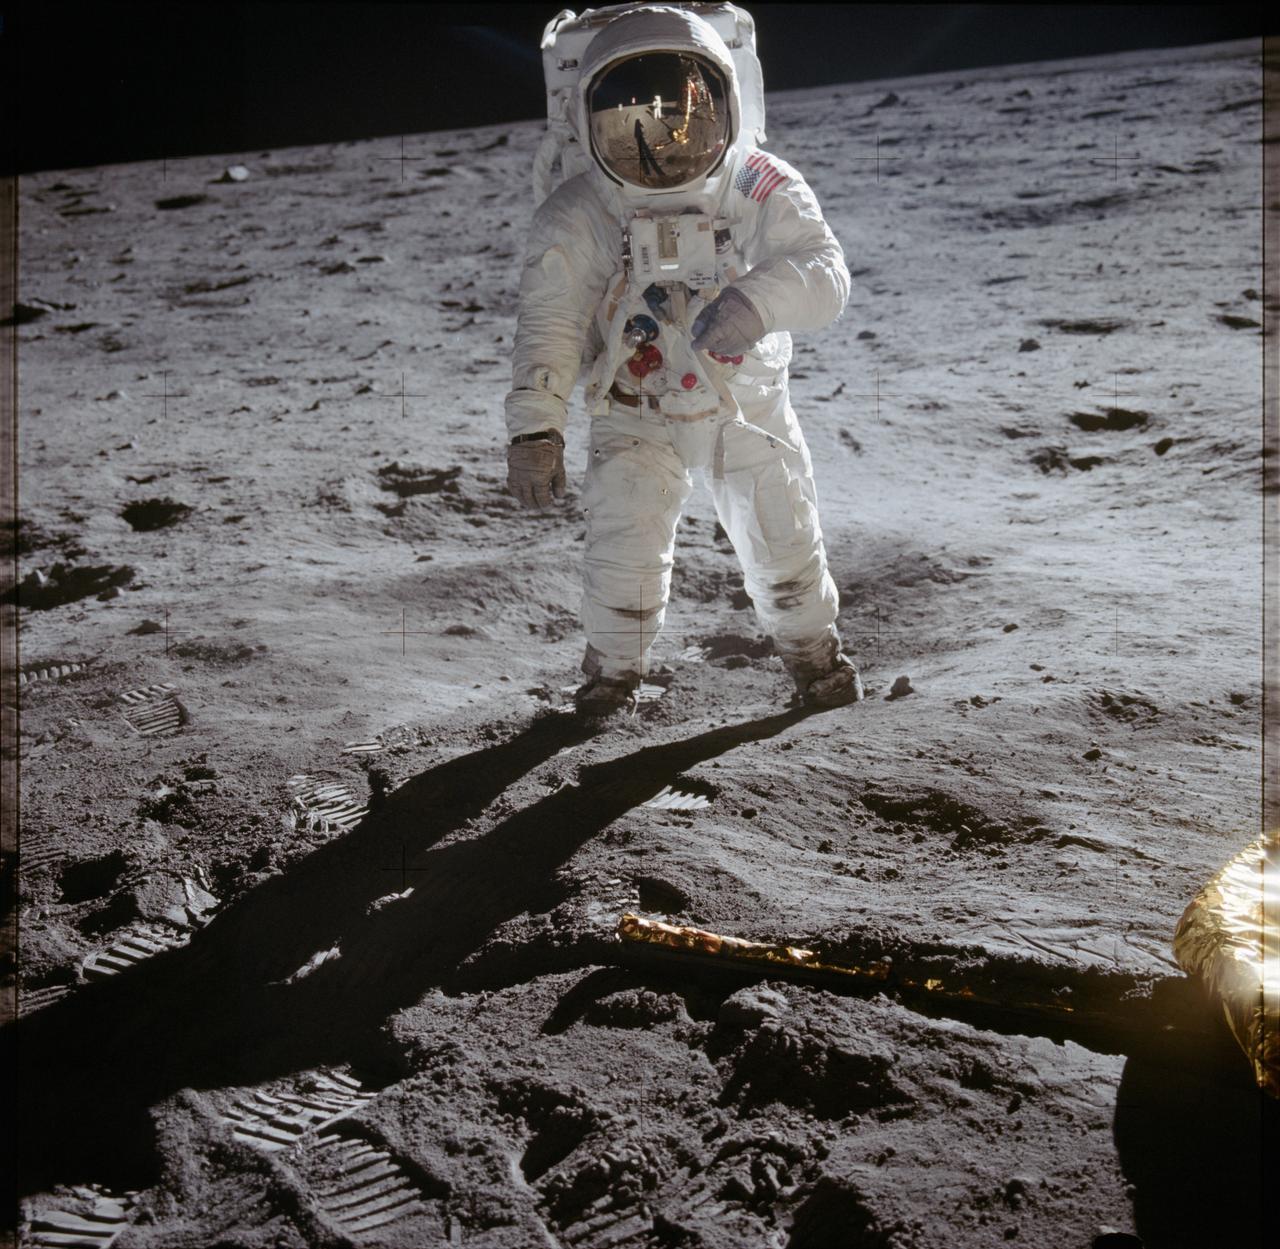 (20 July 1969) --- Astronaut Edwin E. Aldrin Jr., lunar module pilot, walks on the surface of the moon near the leg of the Lunar Module (LM)